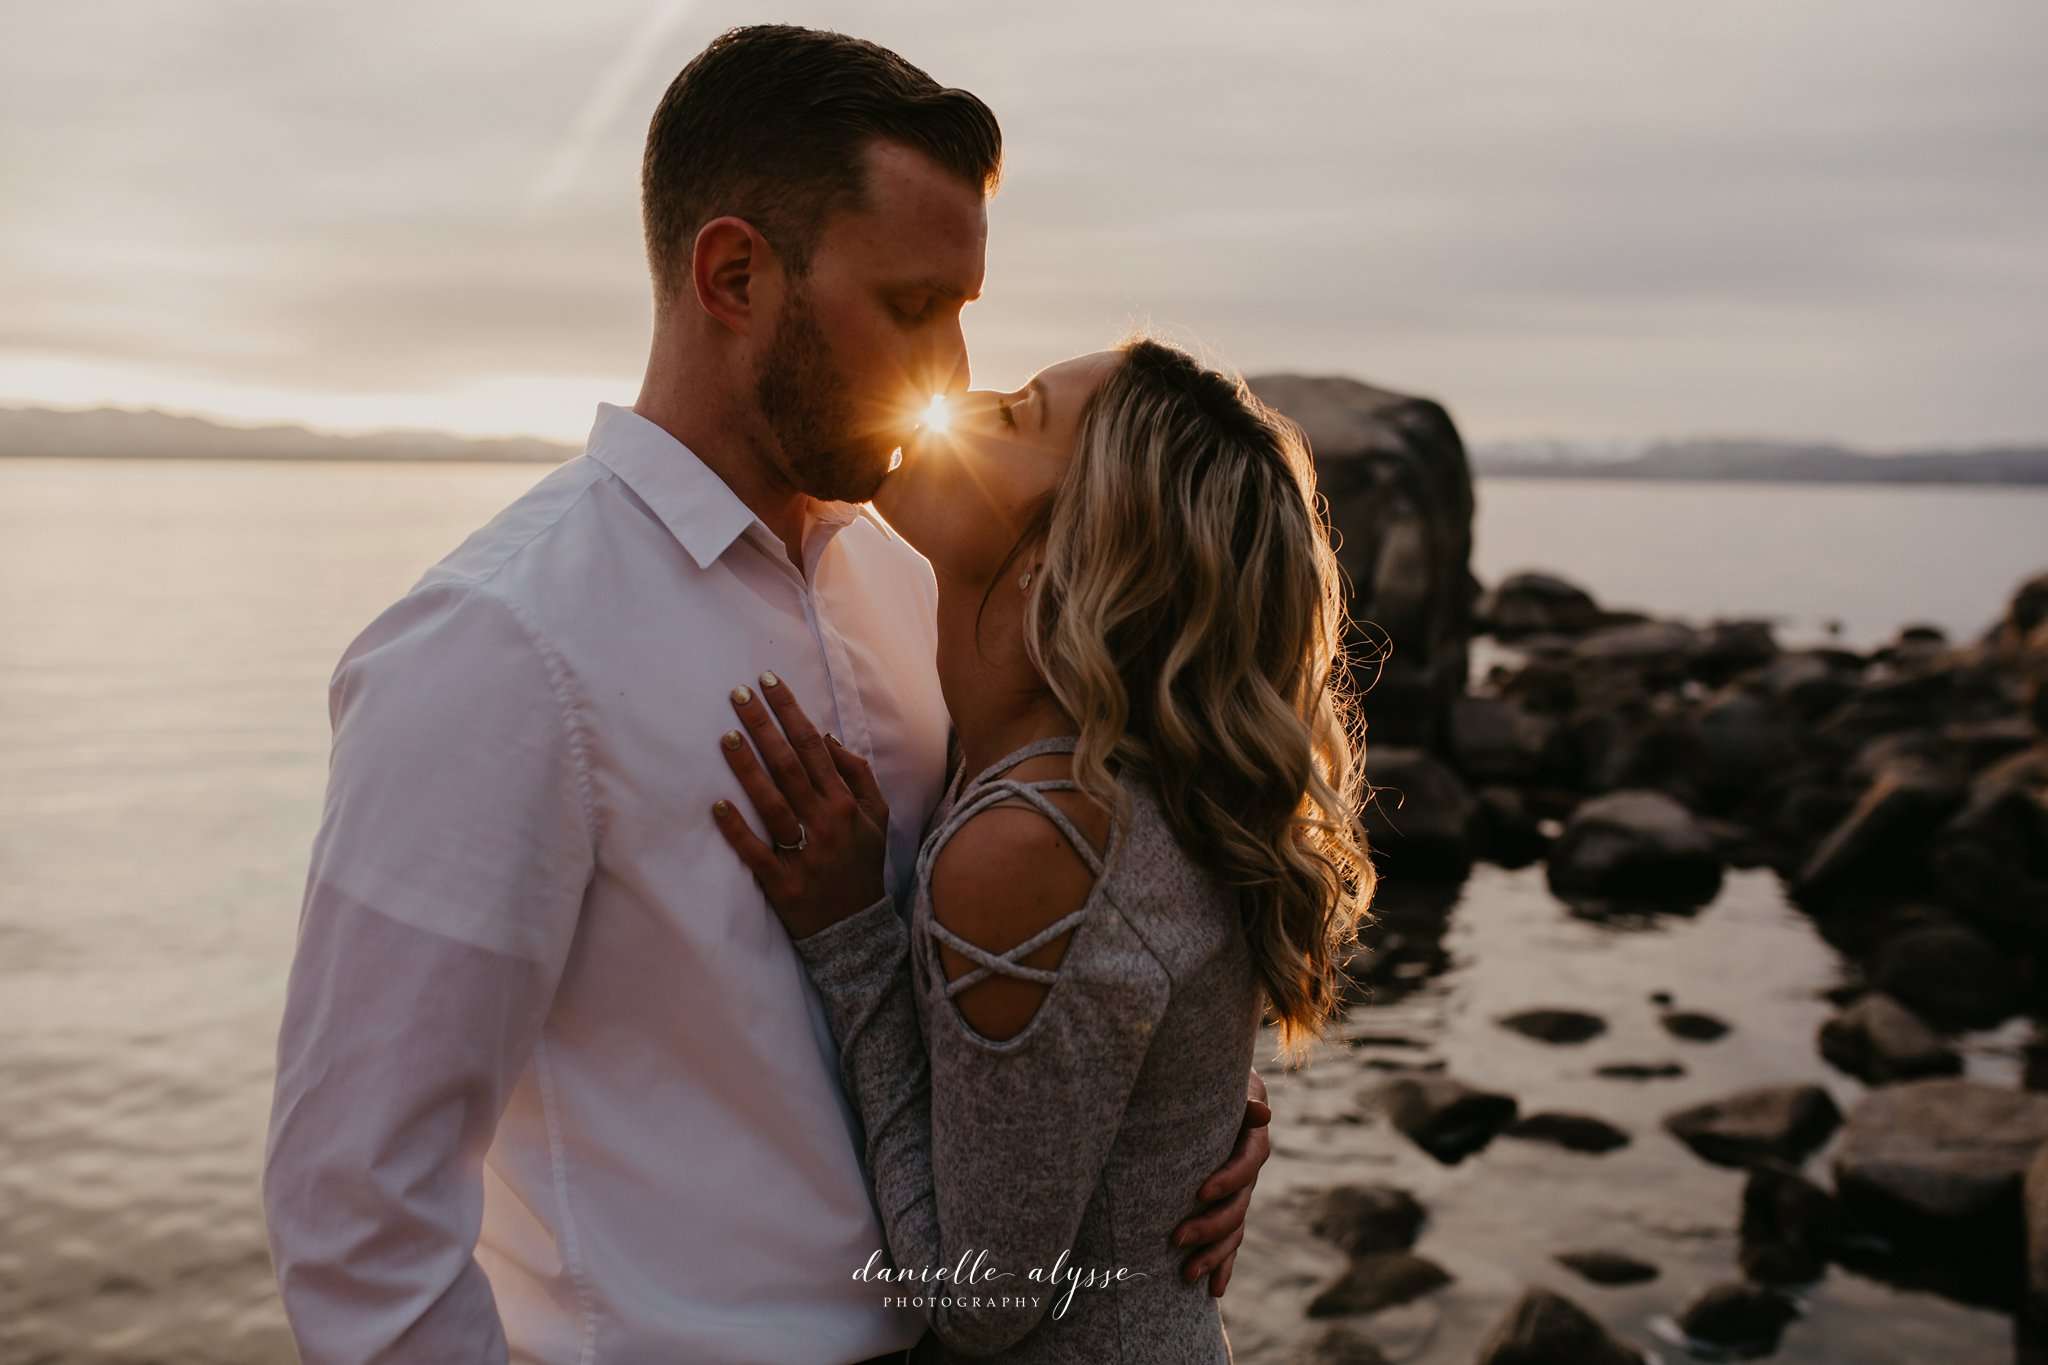 181226_engagement_brittney_fred_tahoe_sand_harbor_danielle_alysse_photography_blog_67_WEB.jpg